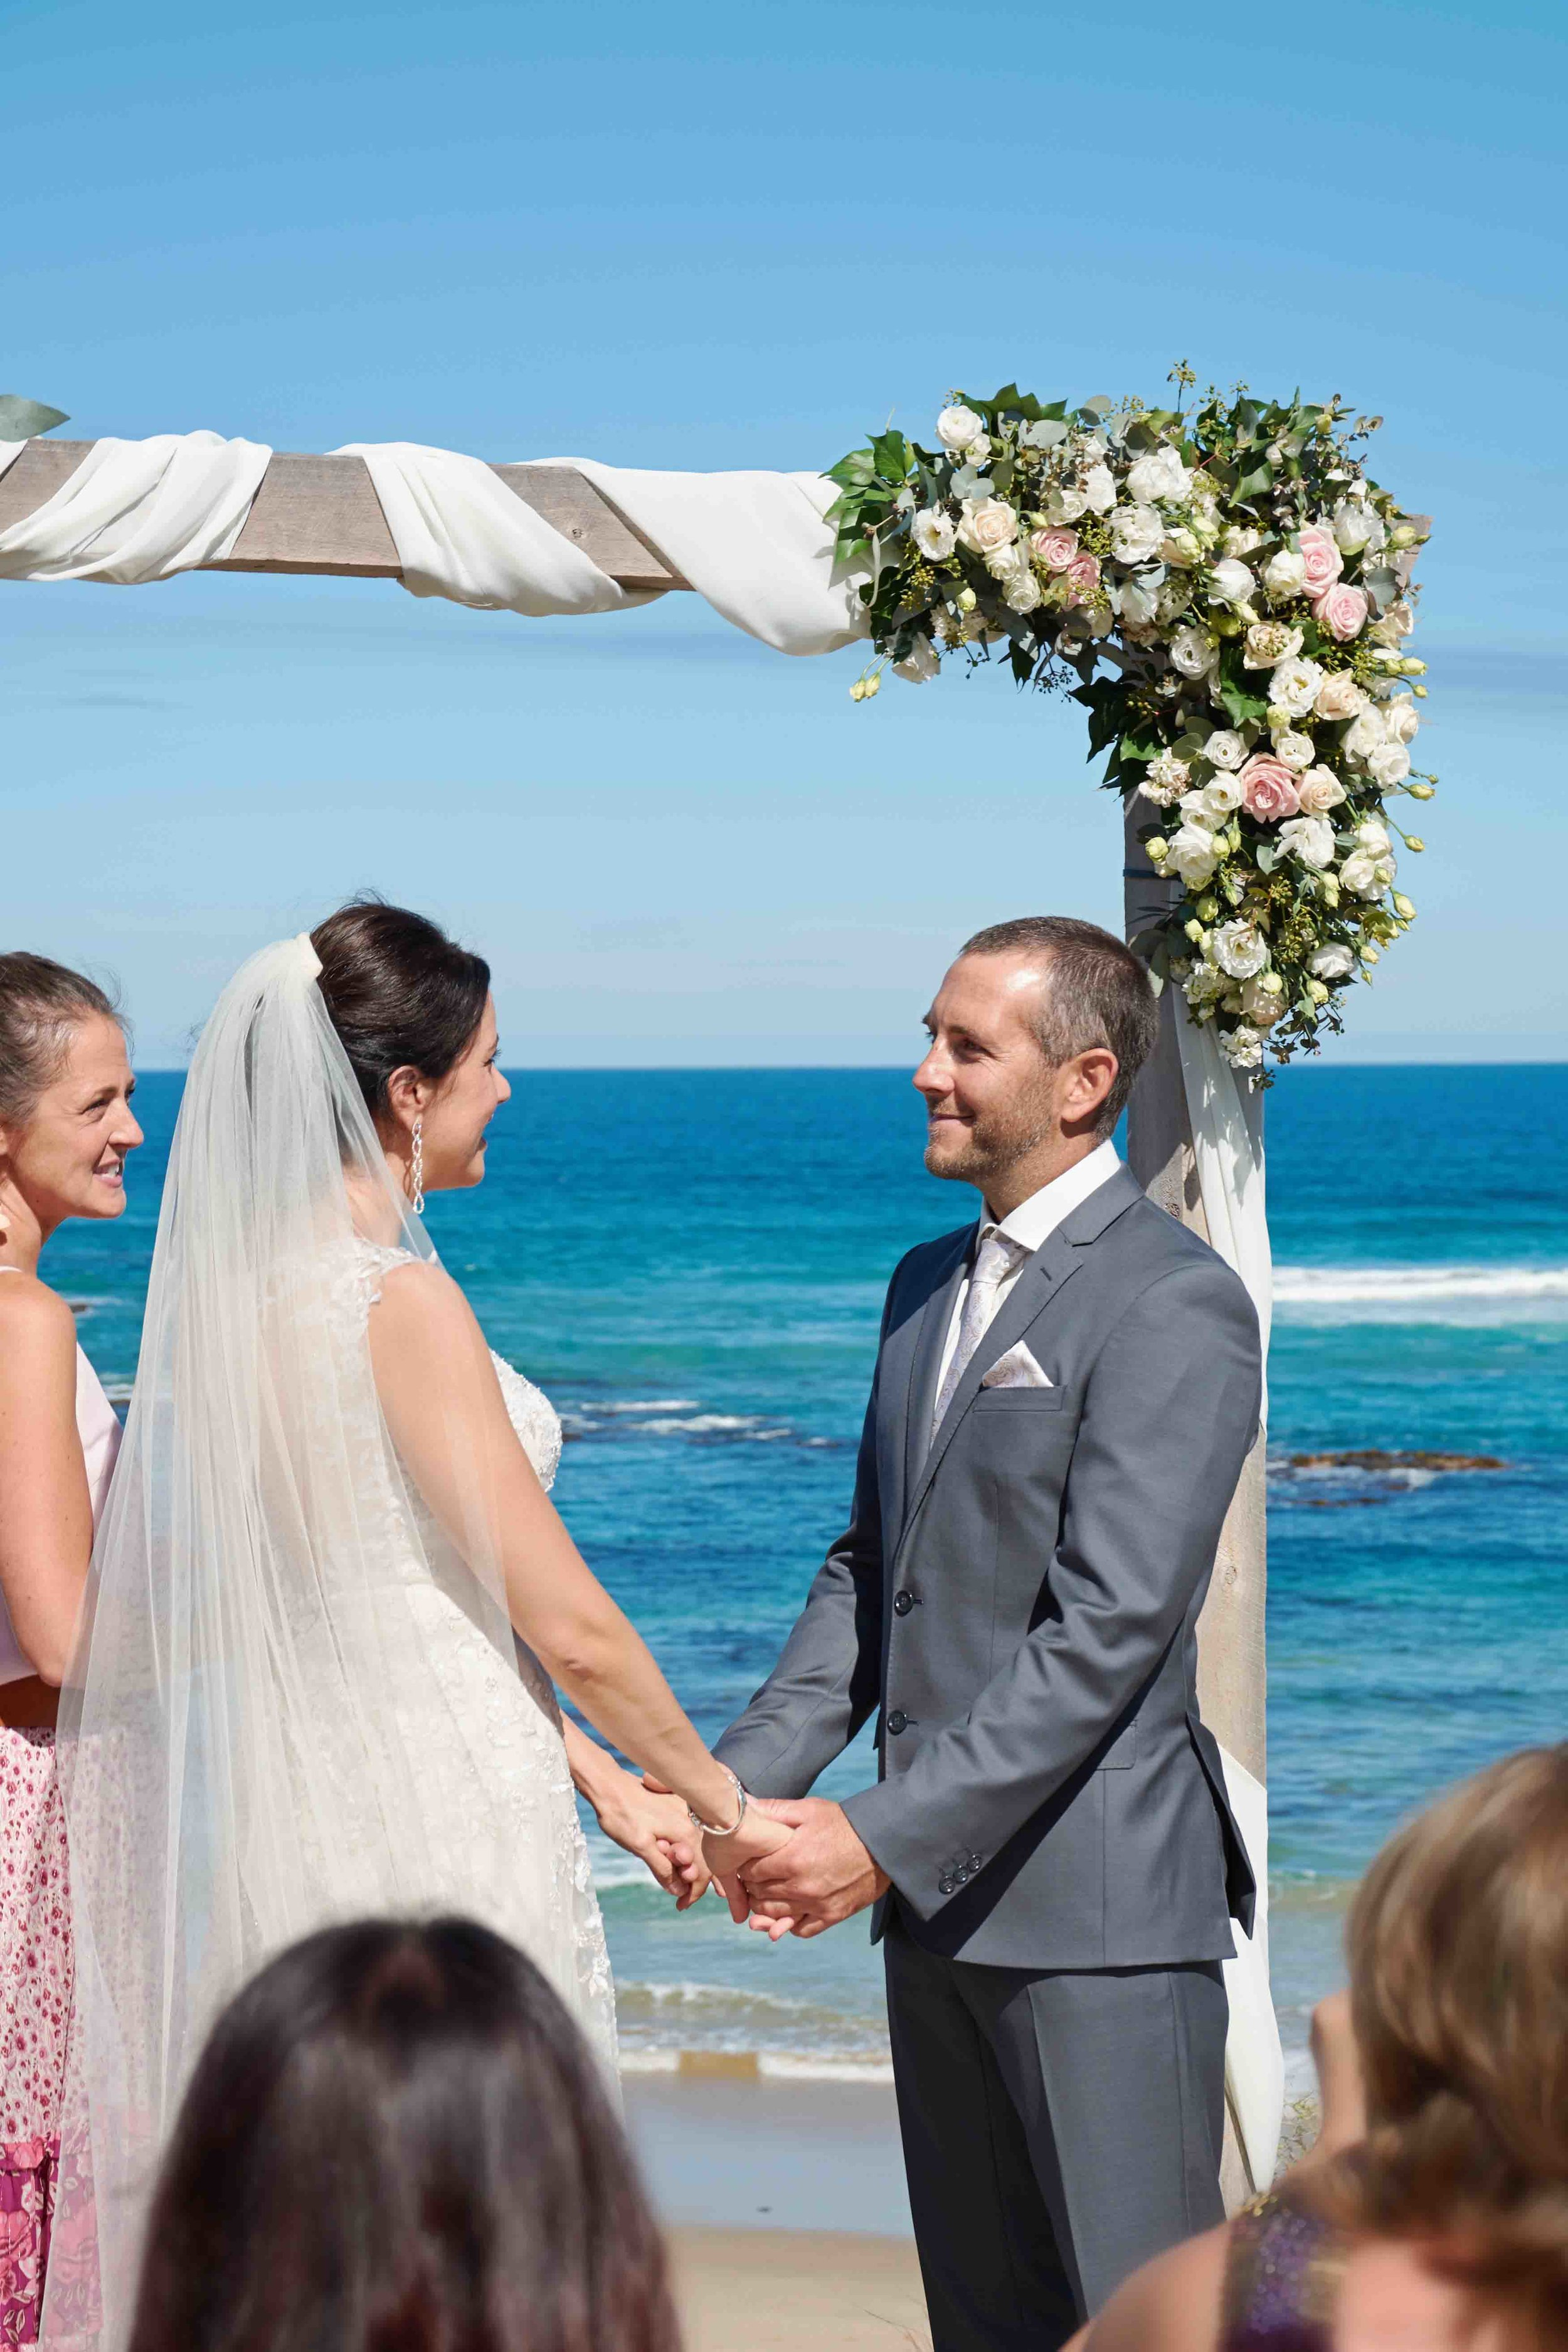 sorrento-wedding-photography-all-smiles-marissa-jade-photography-51.jpg